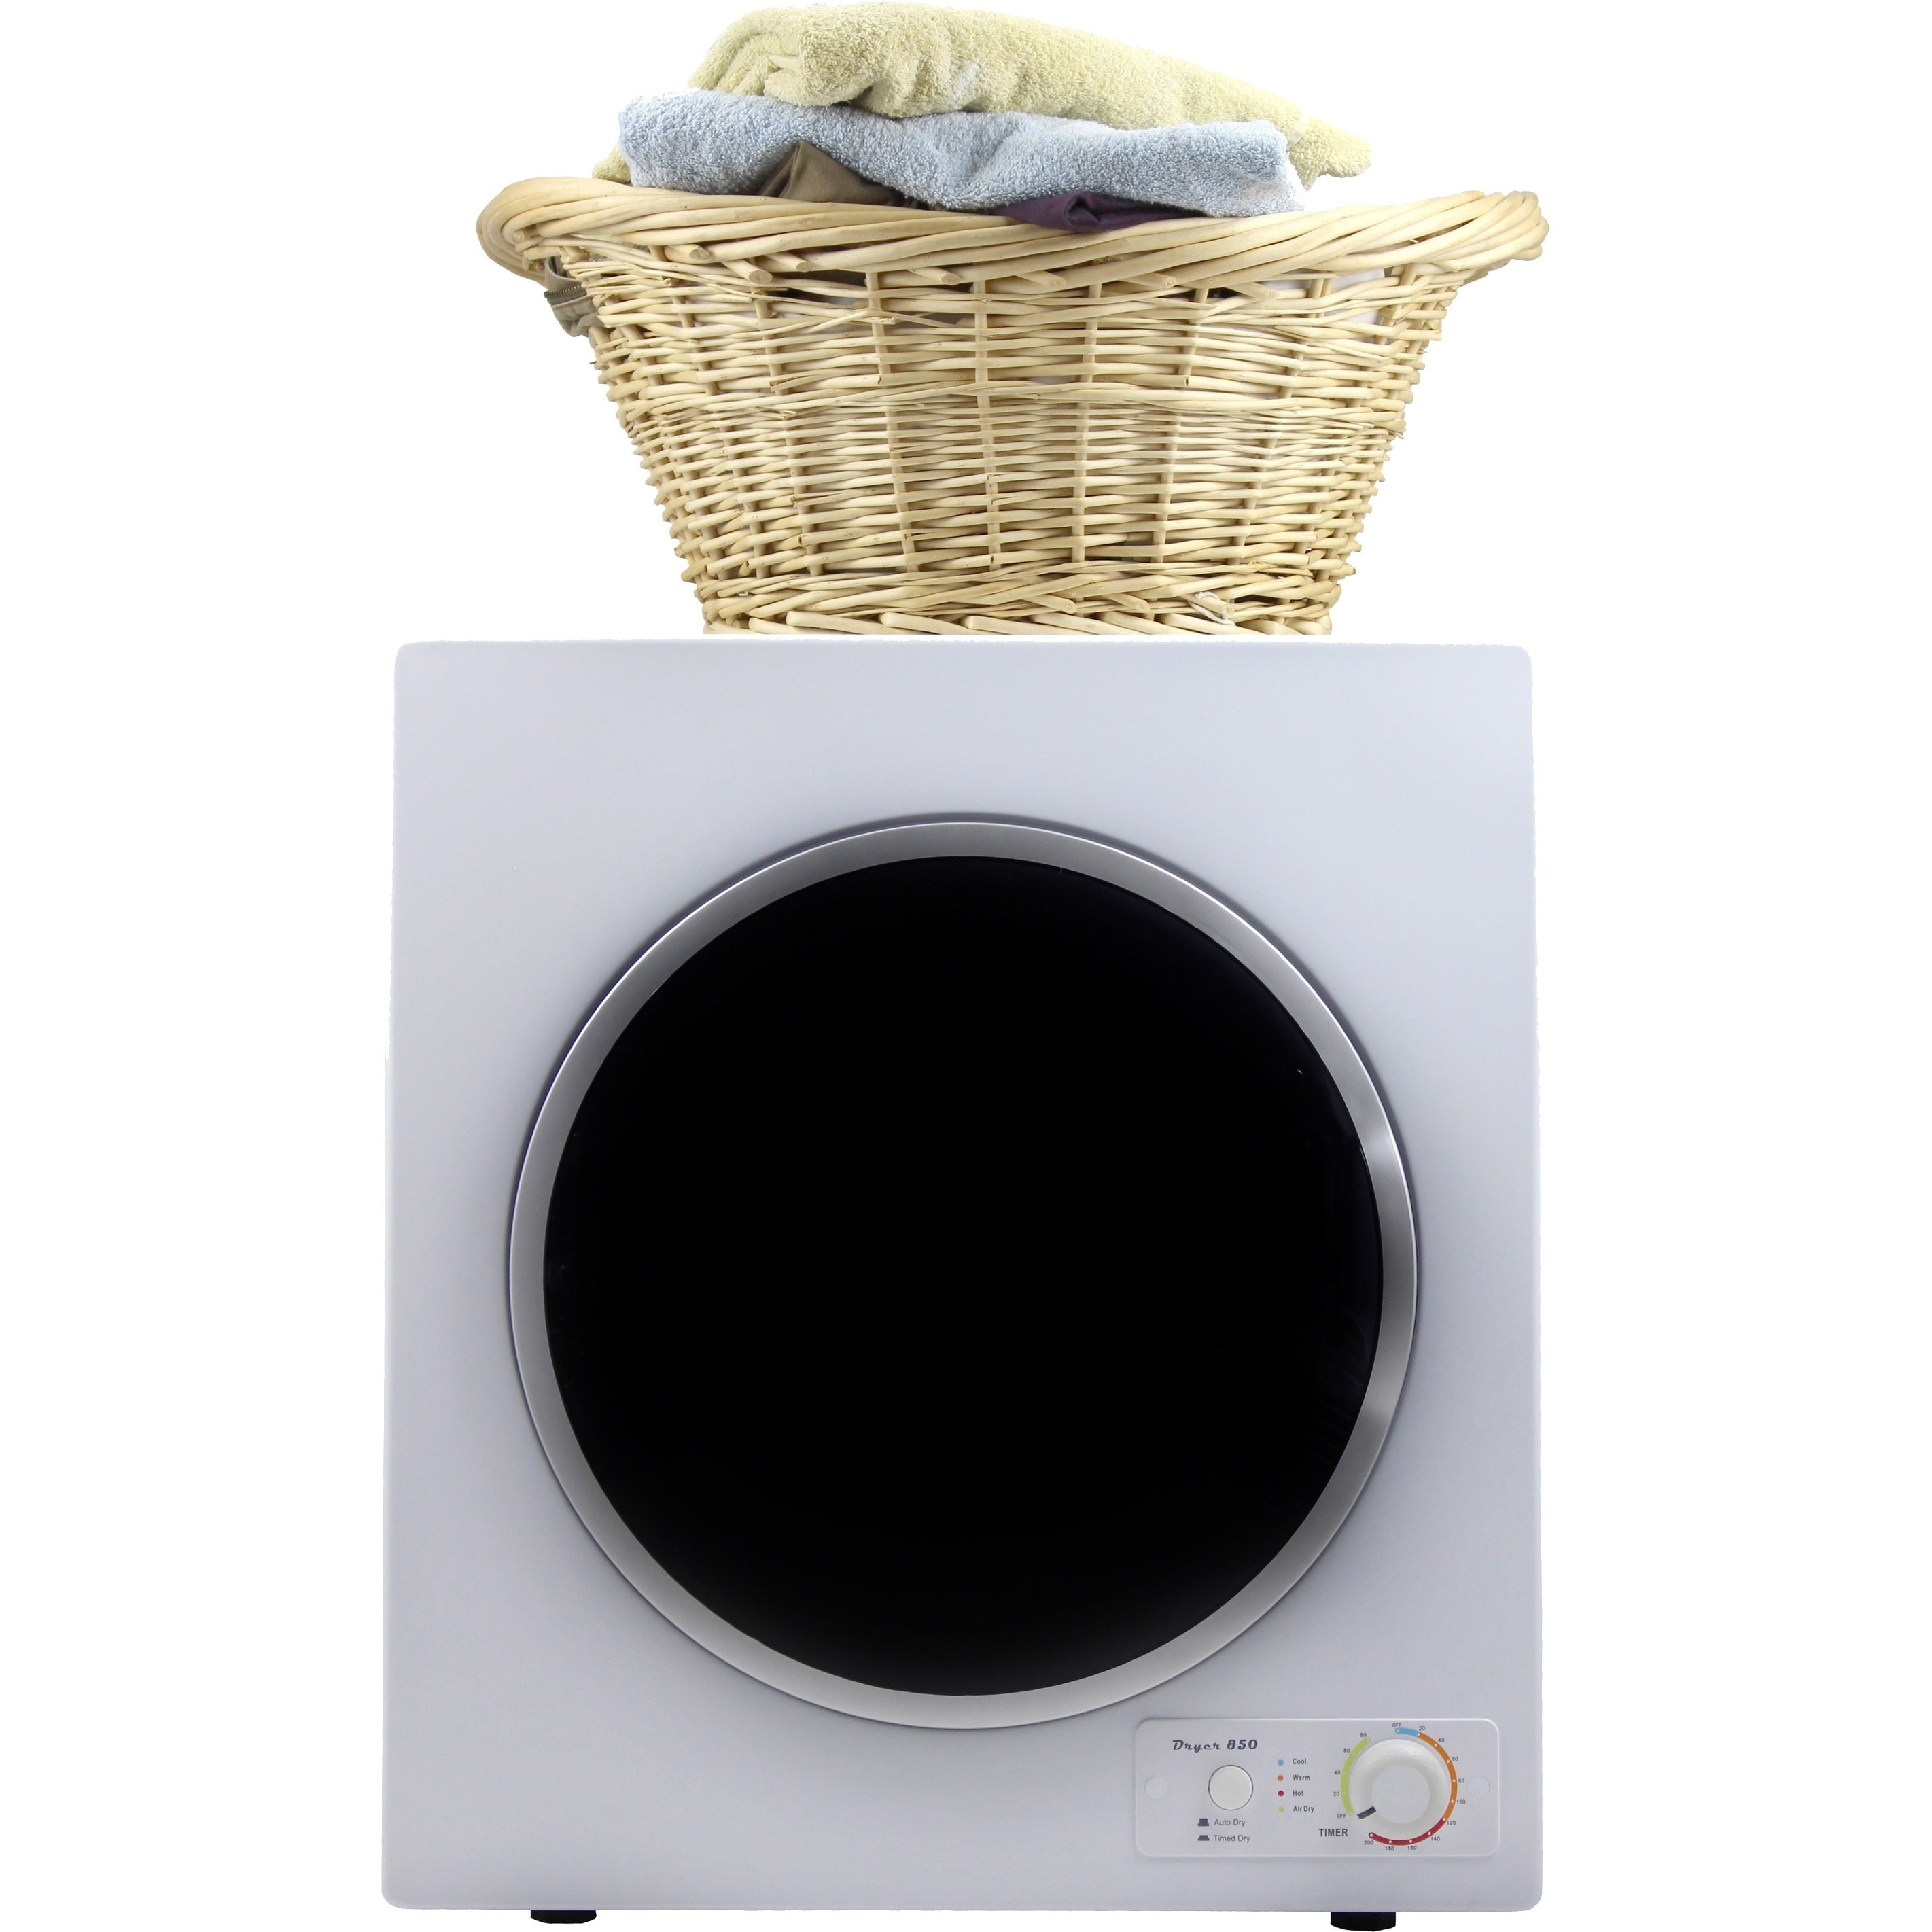 Equator White/ Silver Trim 13-pound Capacity Dryer (White...